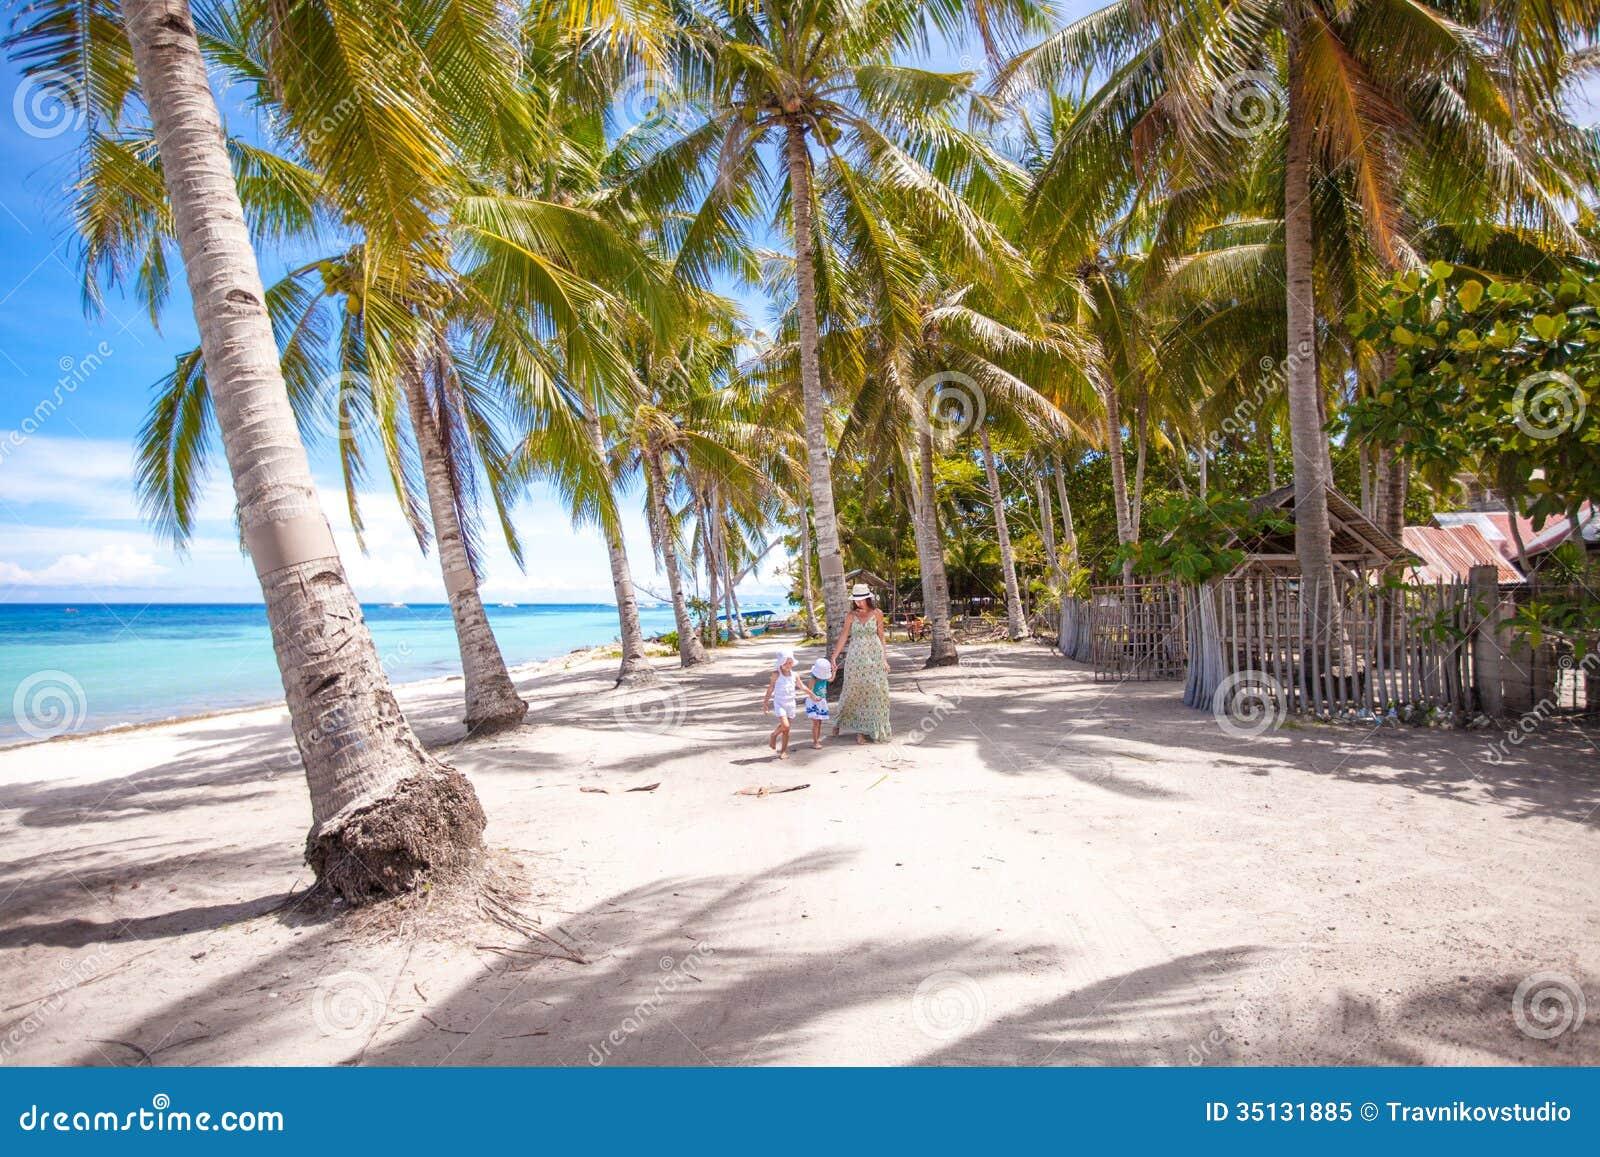 Dungen pa strand